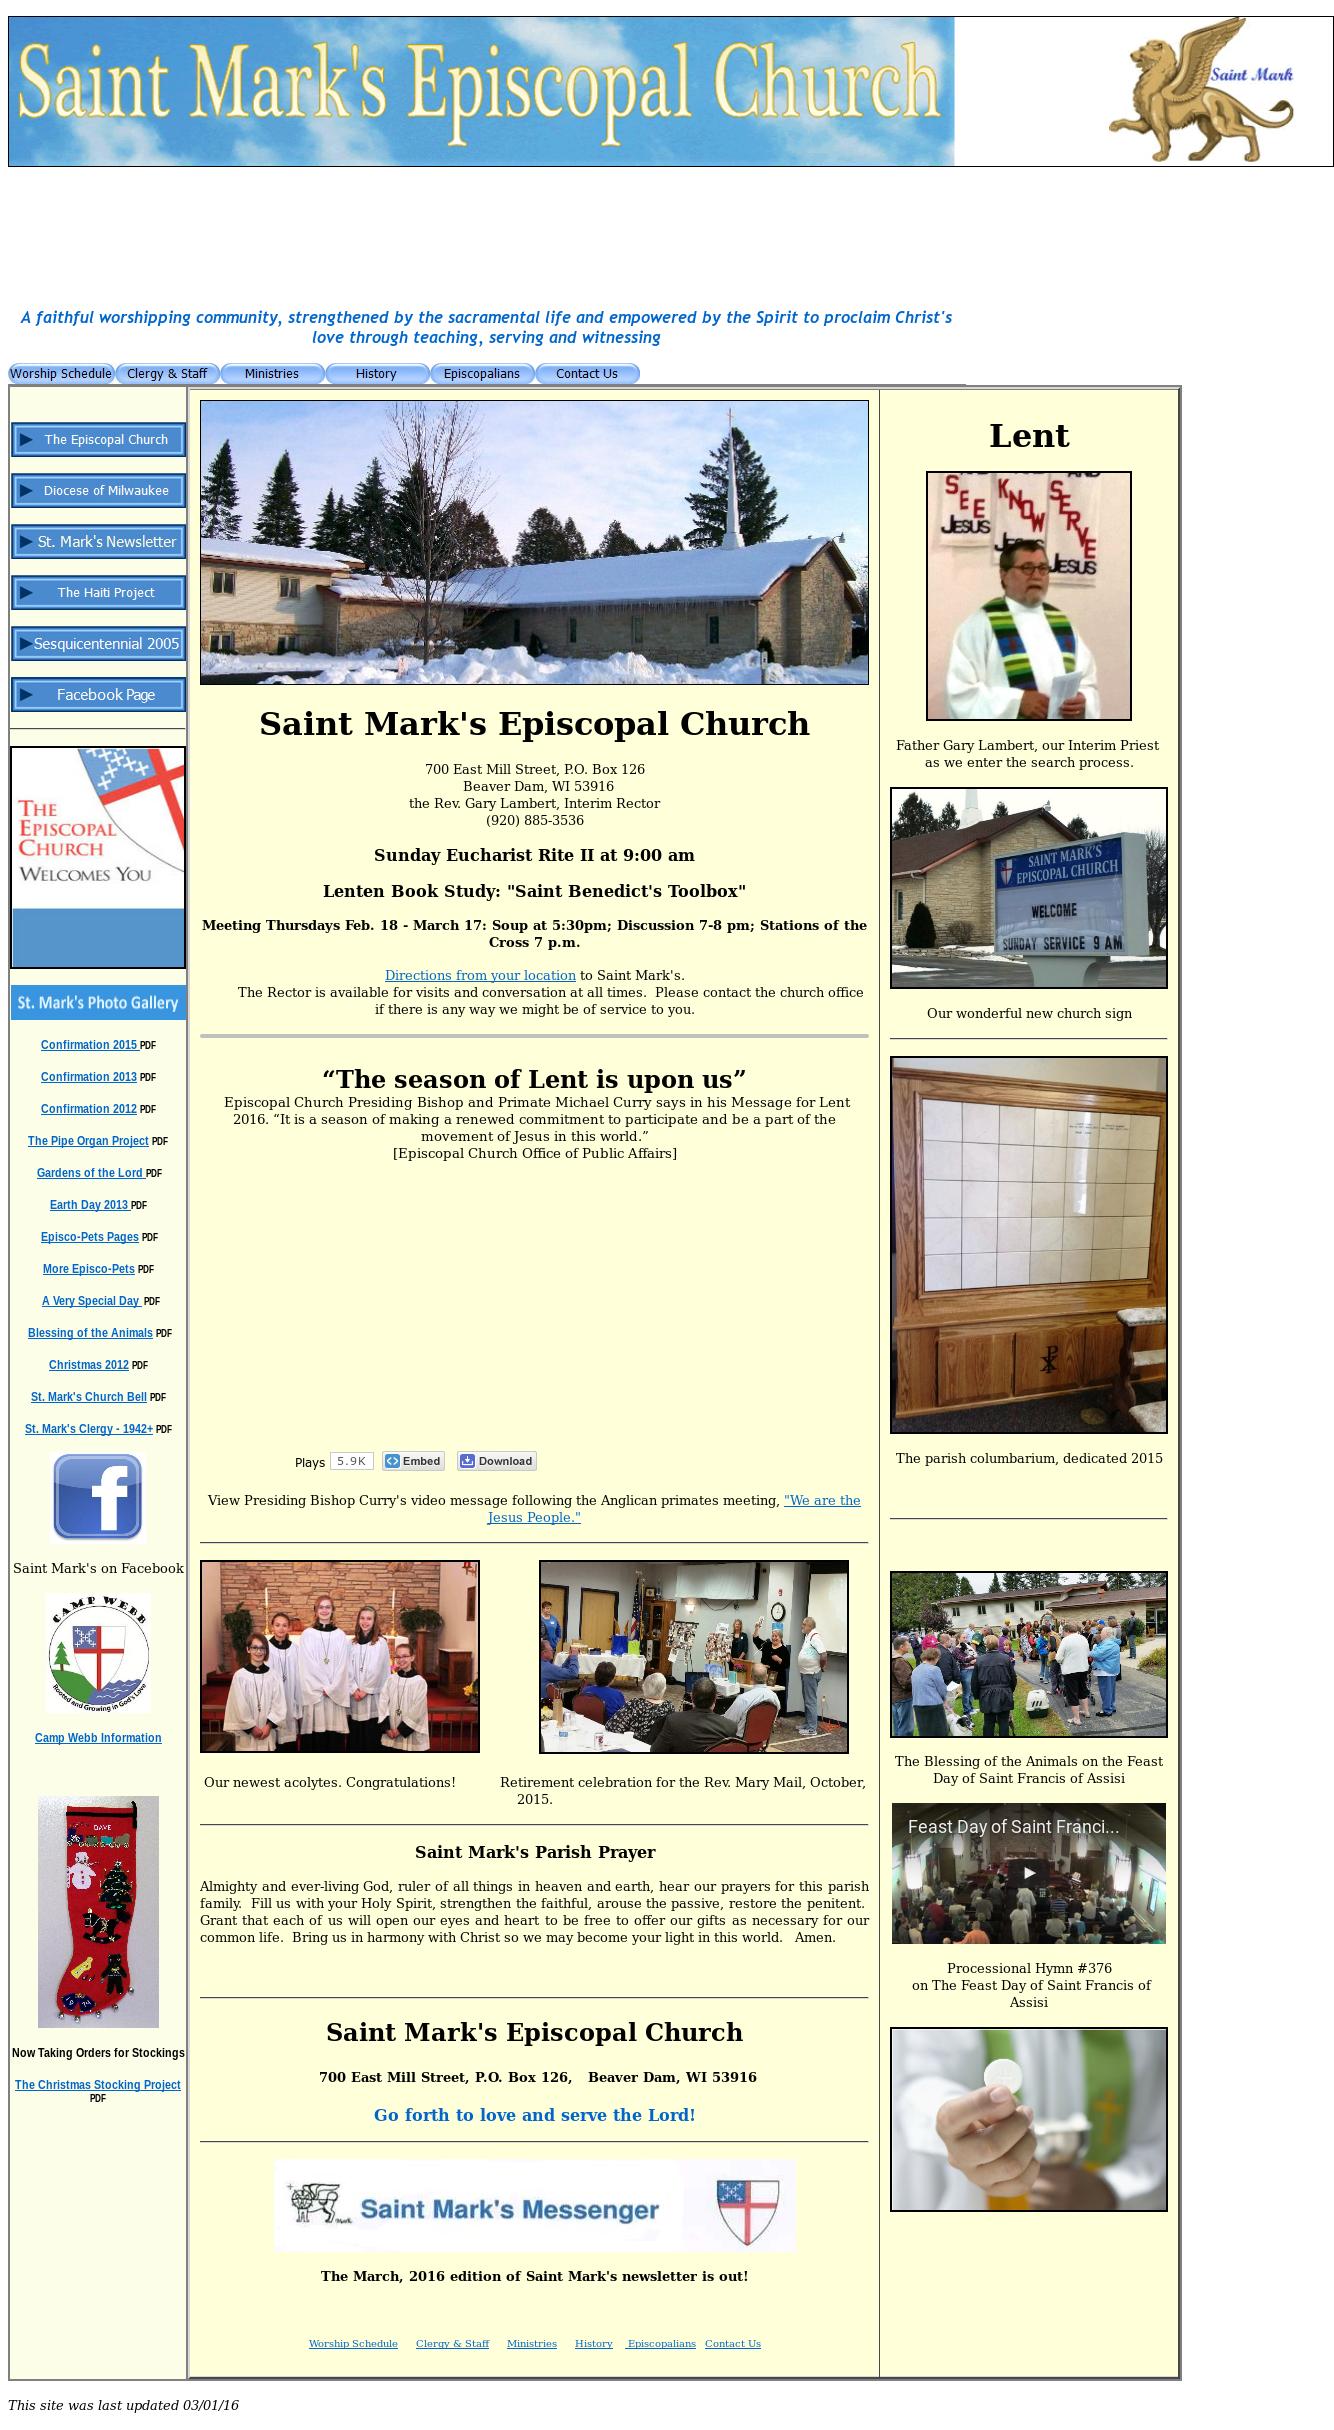 Saint Mark's Episcopal Church, Beaver Dam, Wi Competitors, Revenue